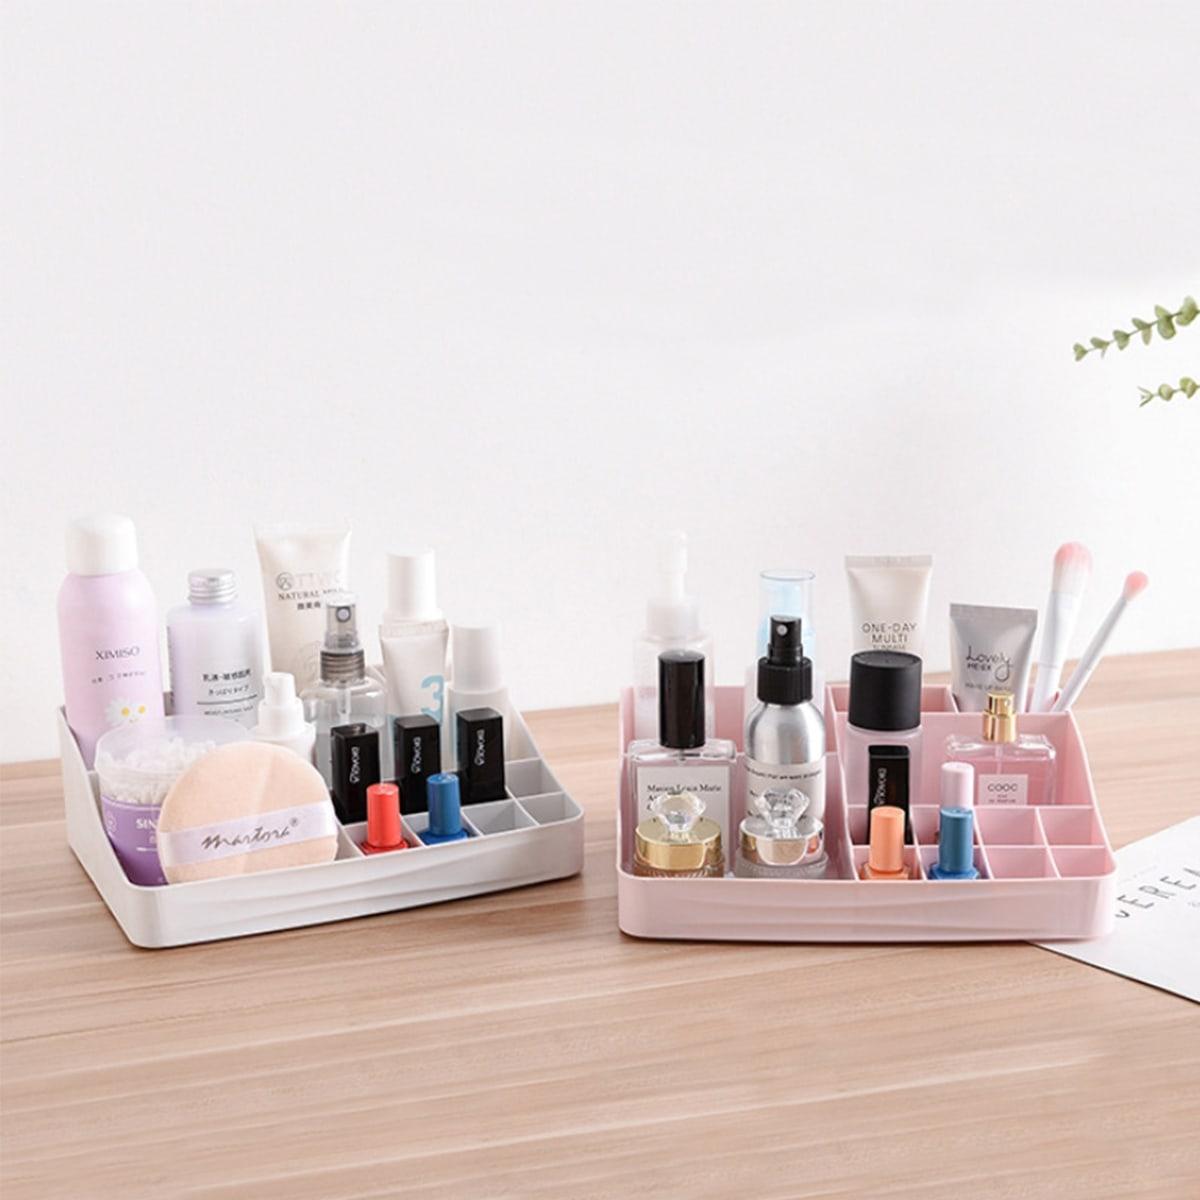 1pc Multi-grid gewone cosmetische opbergdoos